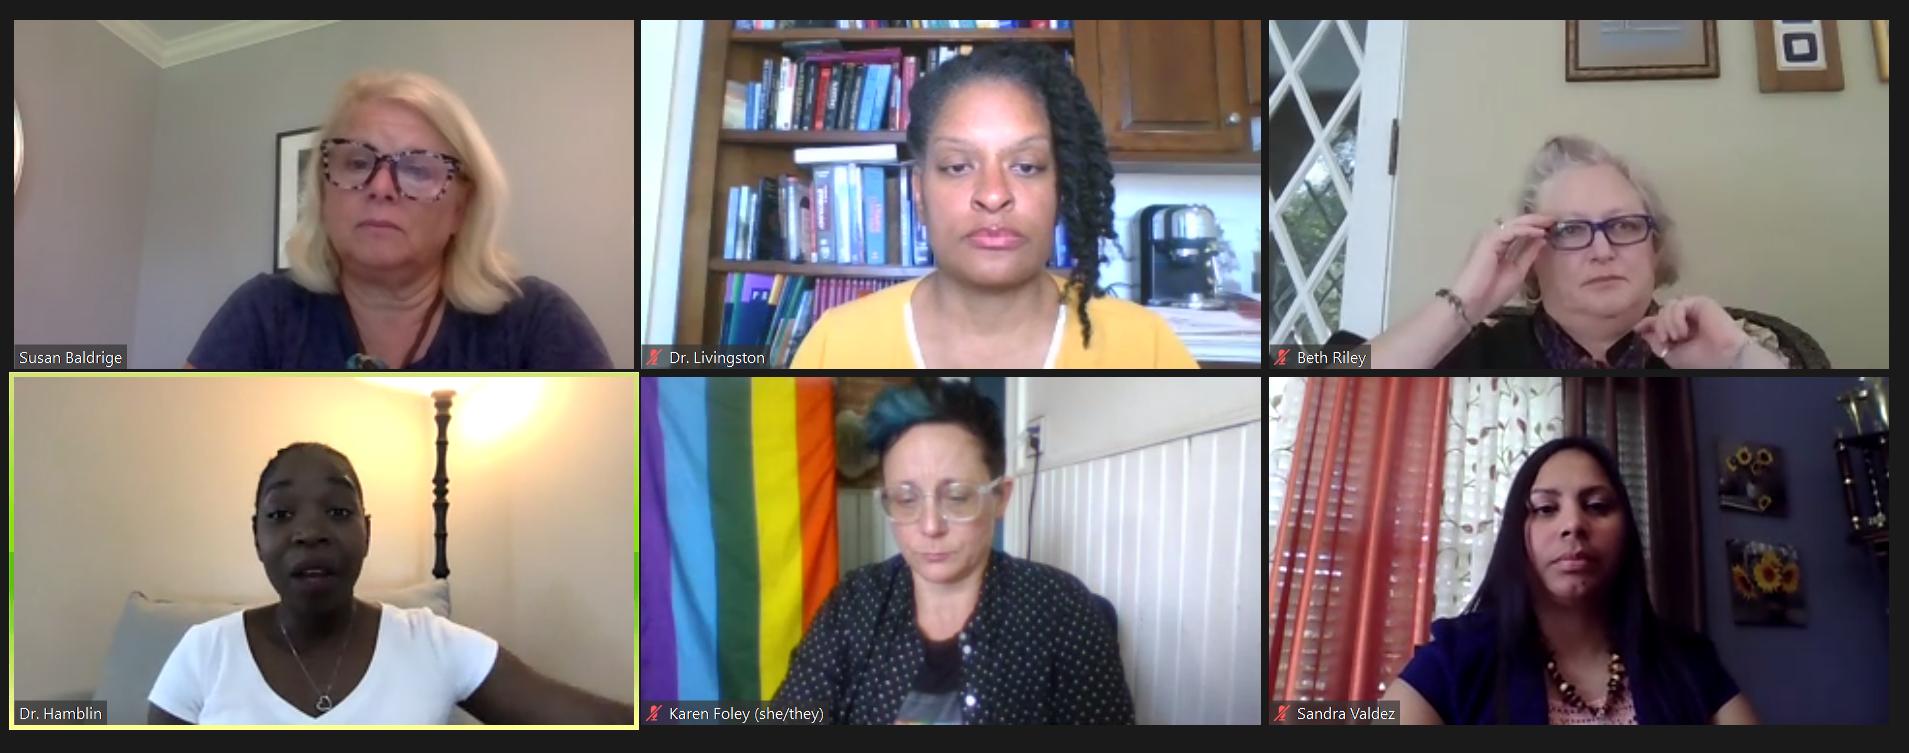 Panelists discuss health equity in Lancaster during a Zoom forum on Thursday, June 10, 2021. Top row: Moderator Susan Baldrige, Dr. Sharee Livingston, Beth Riley. Bottom row: Dr. Cherise Hamblin, Karen Foley, Sandra Valdez. (Source: United Way of Lancaster County)